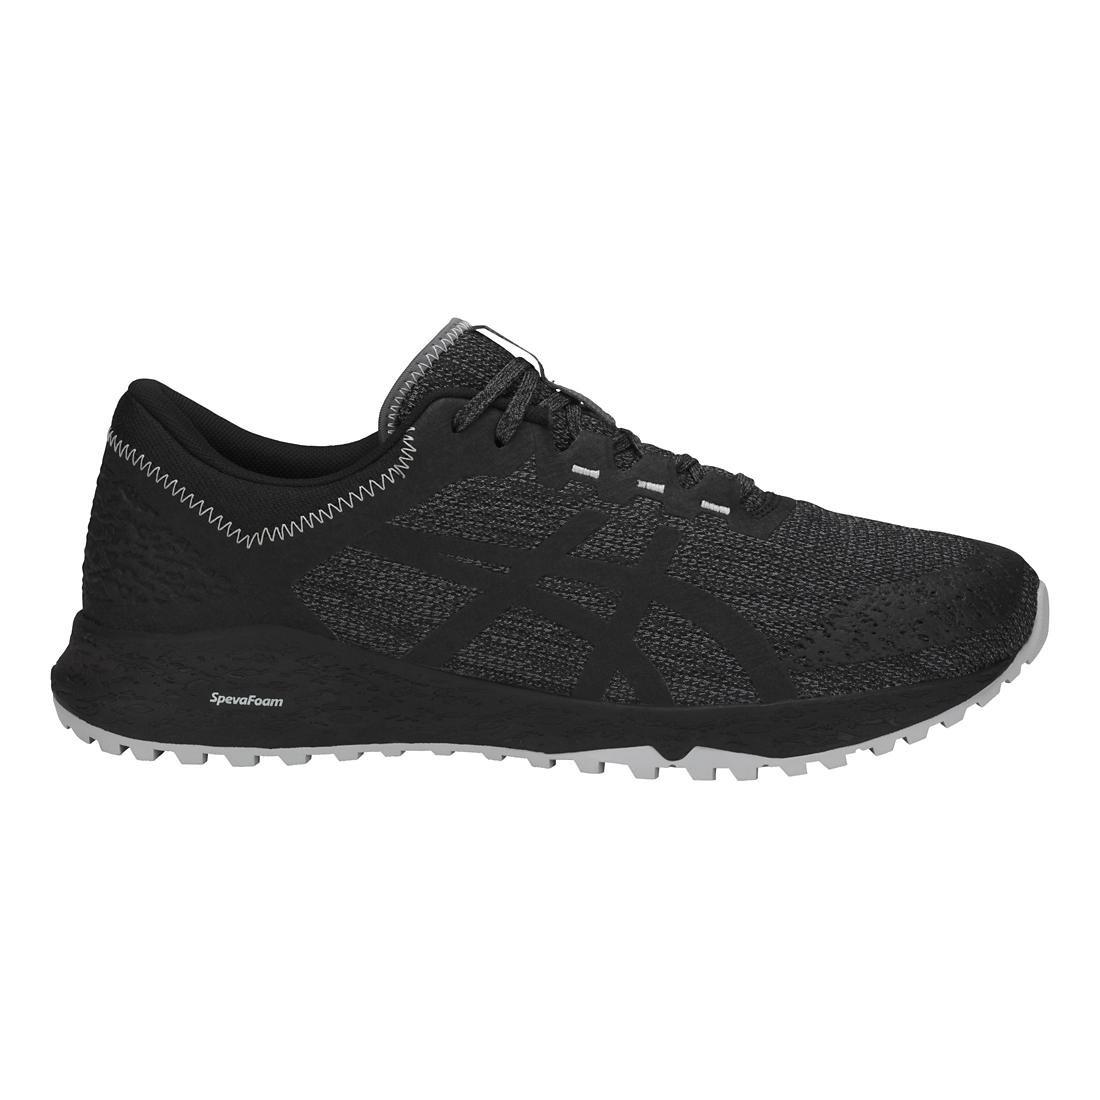 ASICS Mens Alpine XT Running Shoe B072BXR623 12.5 D(M) US|Carbon/Phantom/Mid Grey